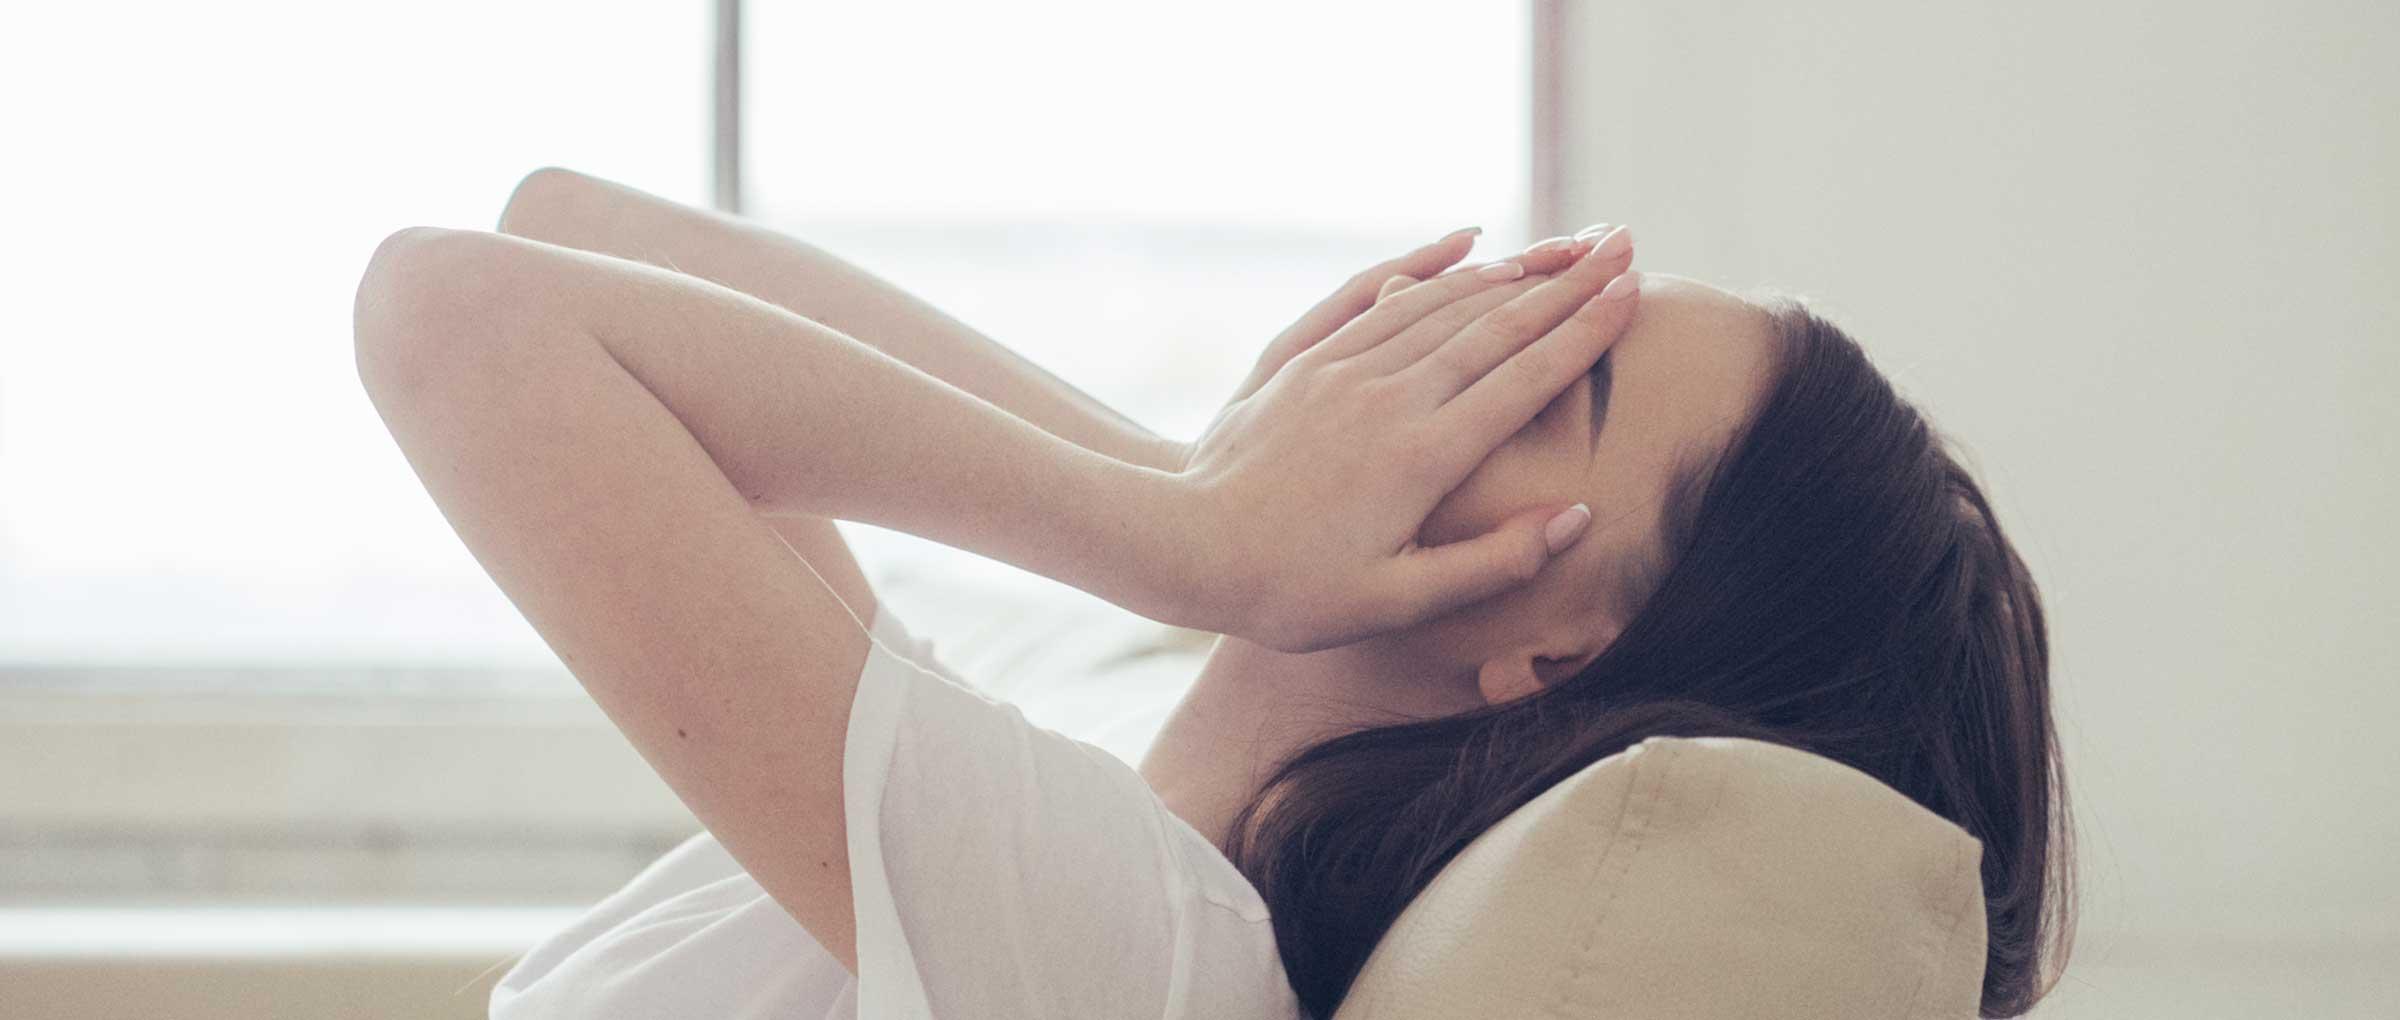 How to overcome IVF failure